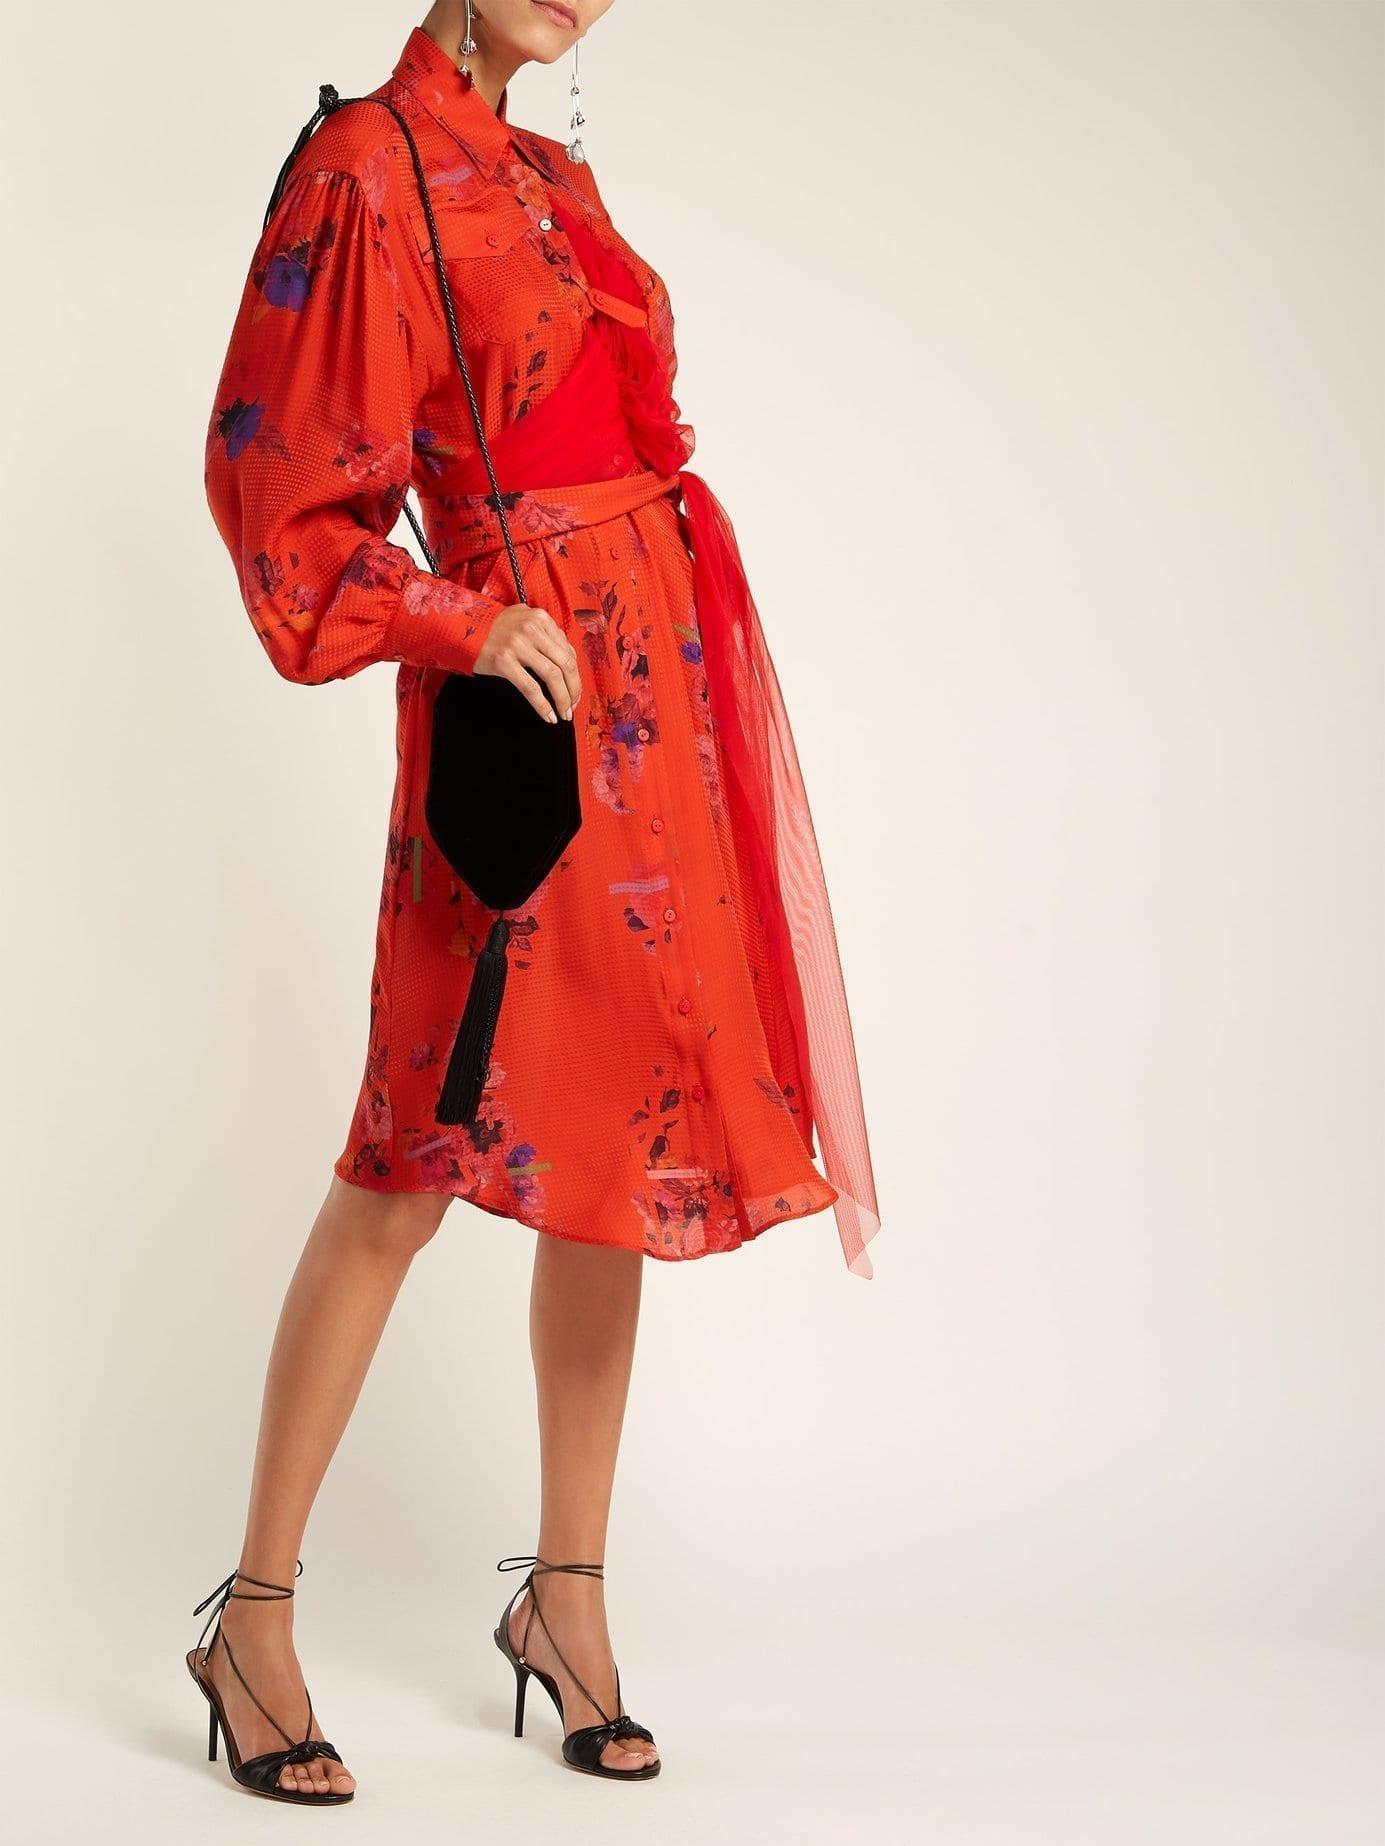 PREEN BY THORNTON BREGAZZI Susanna Silk Shirt Red / Floral Printed Dress